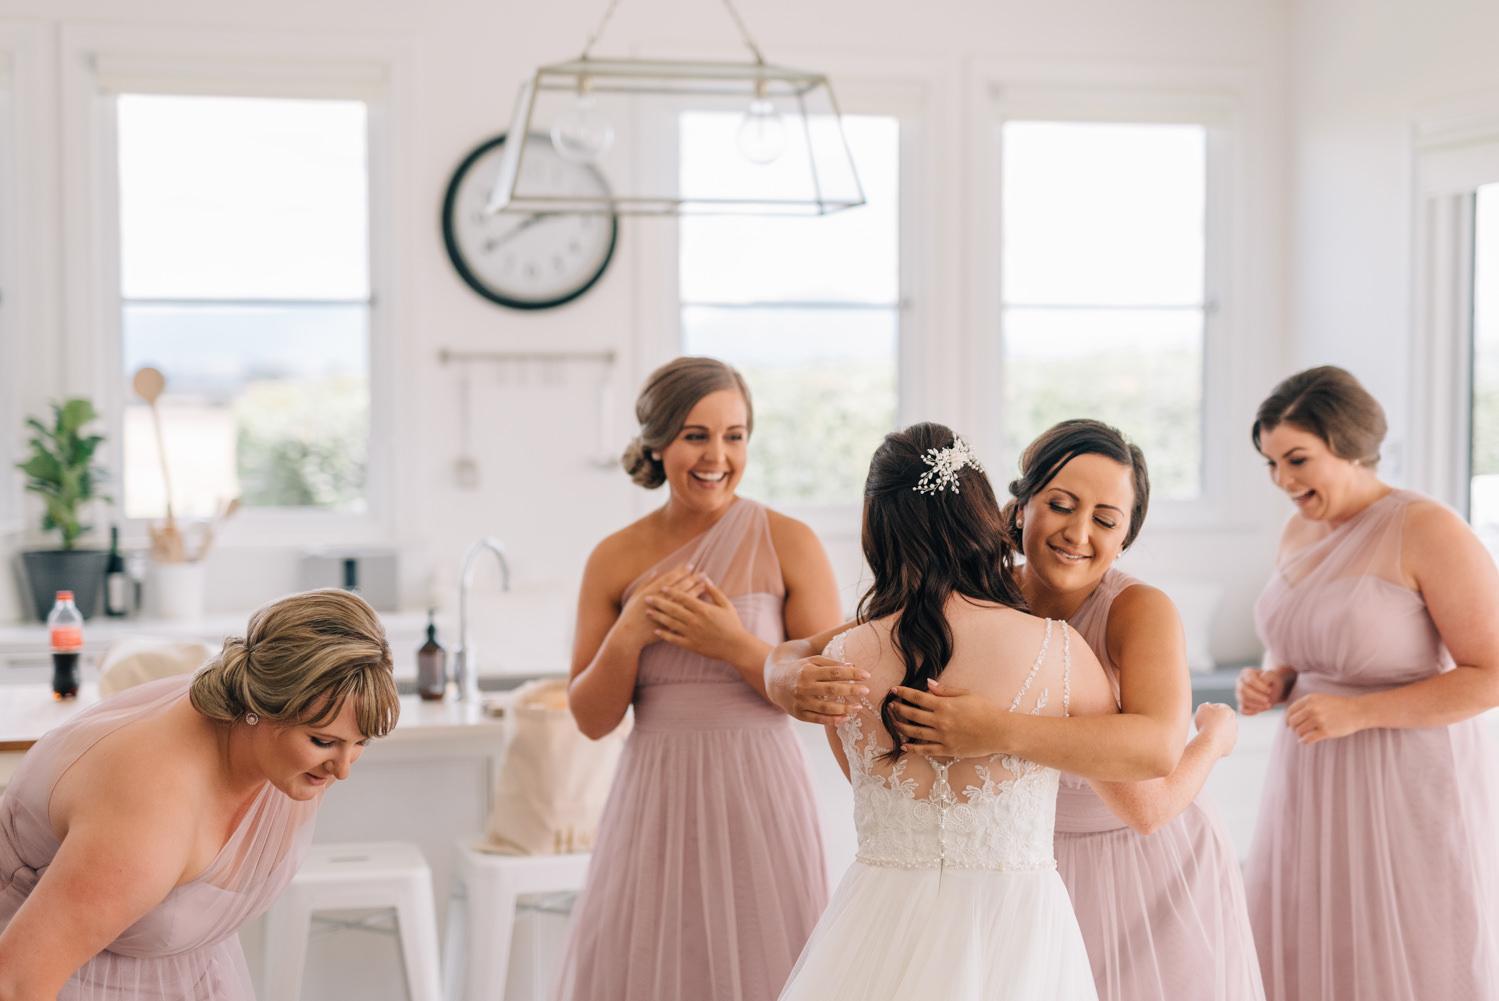 Quamby-Wedding-Photographer-39.jpg